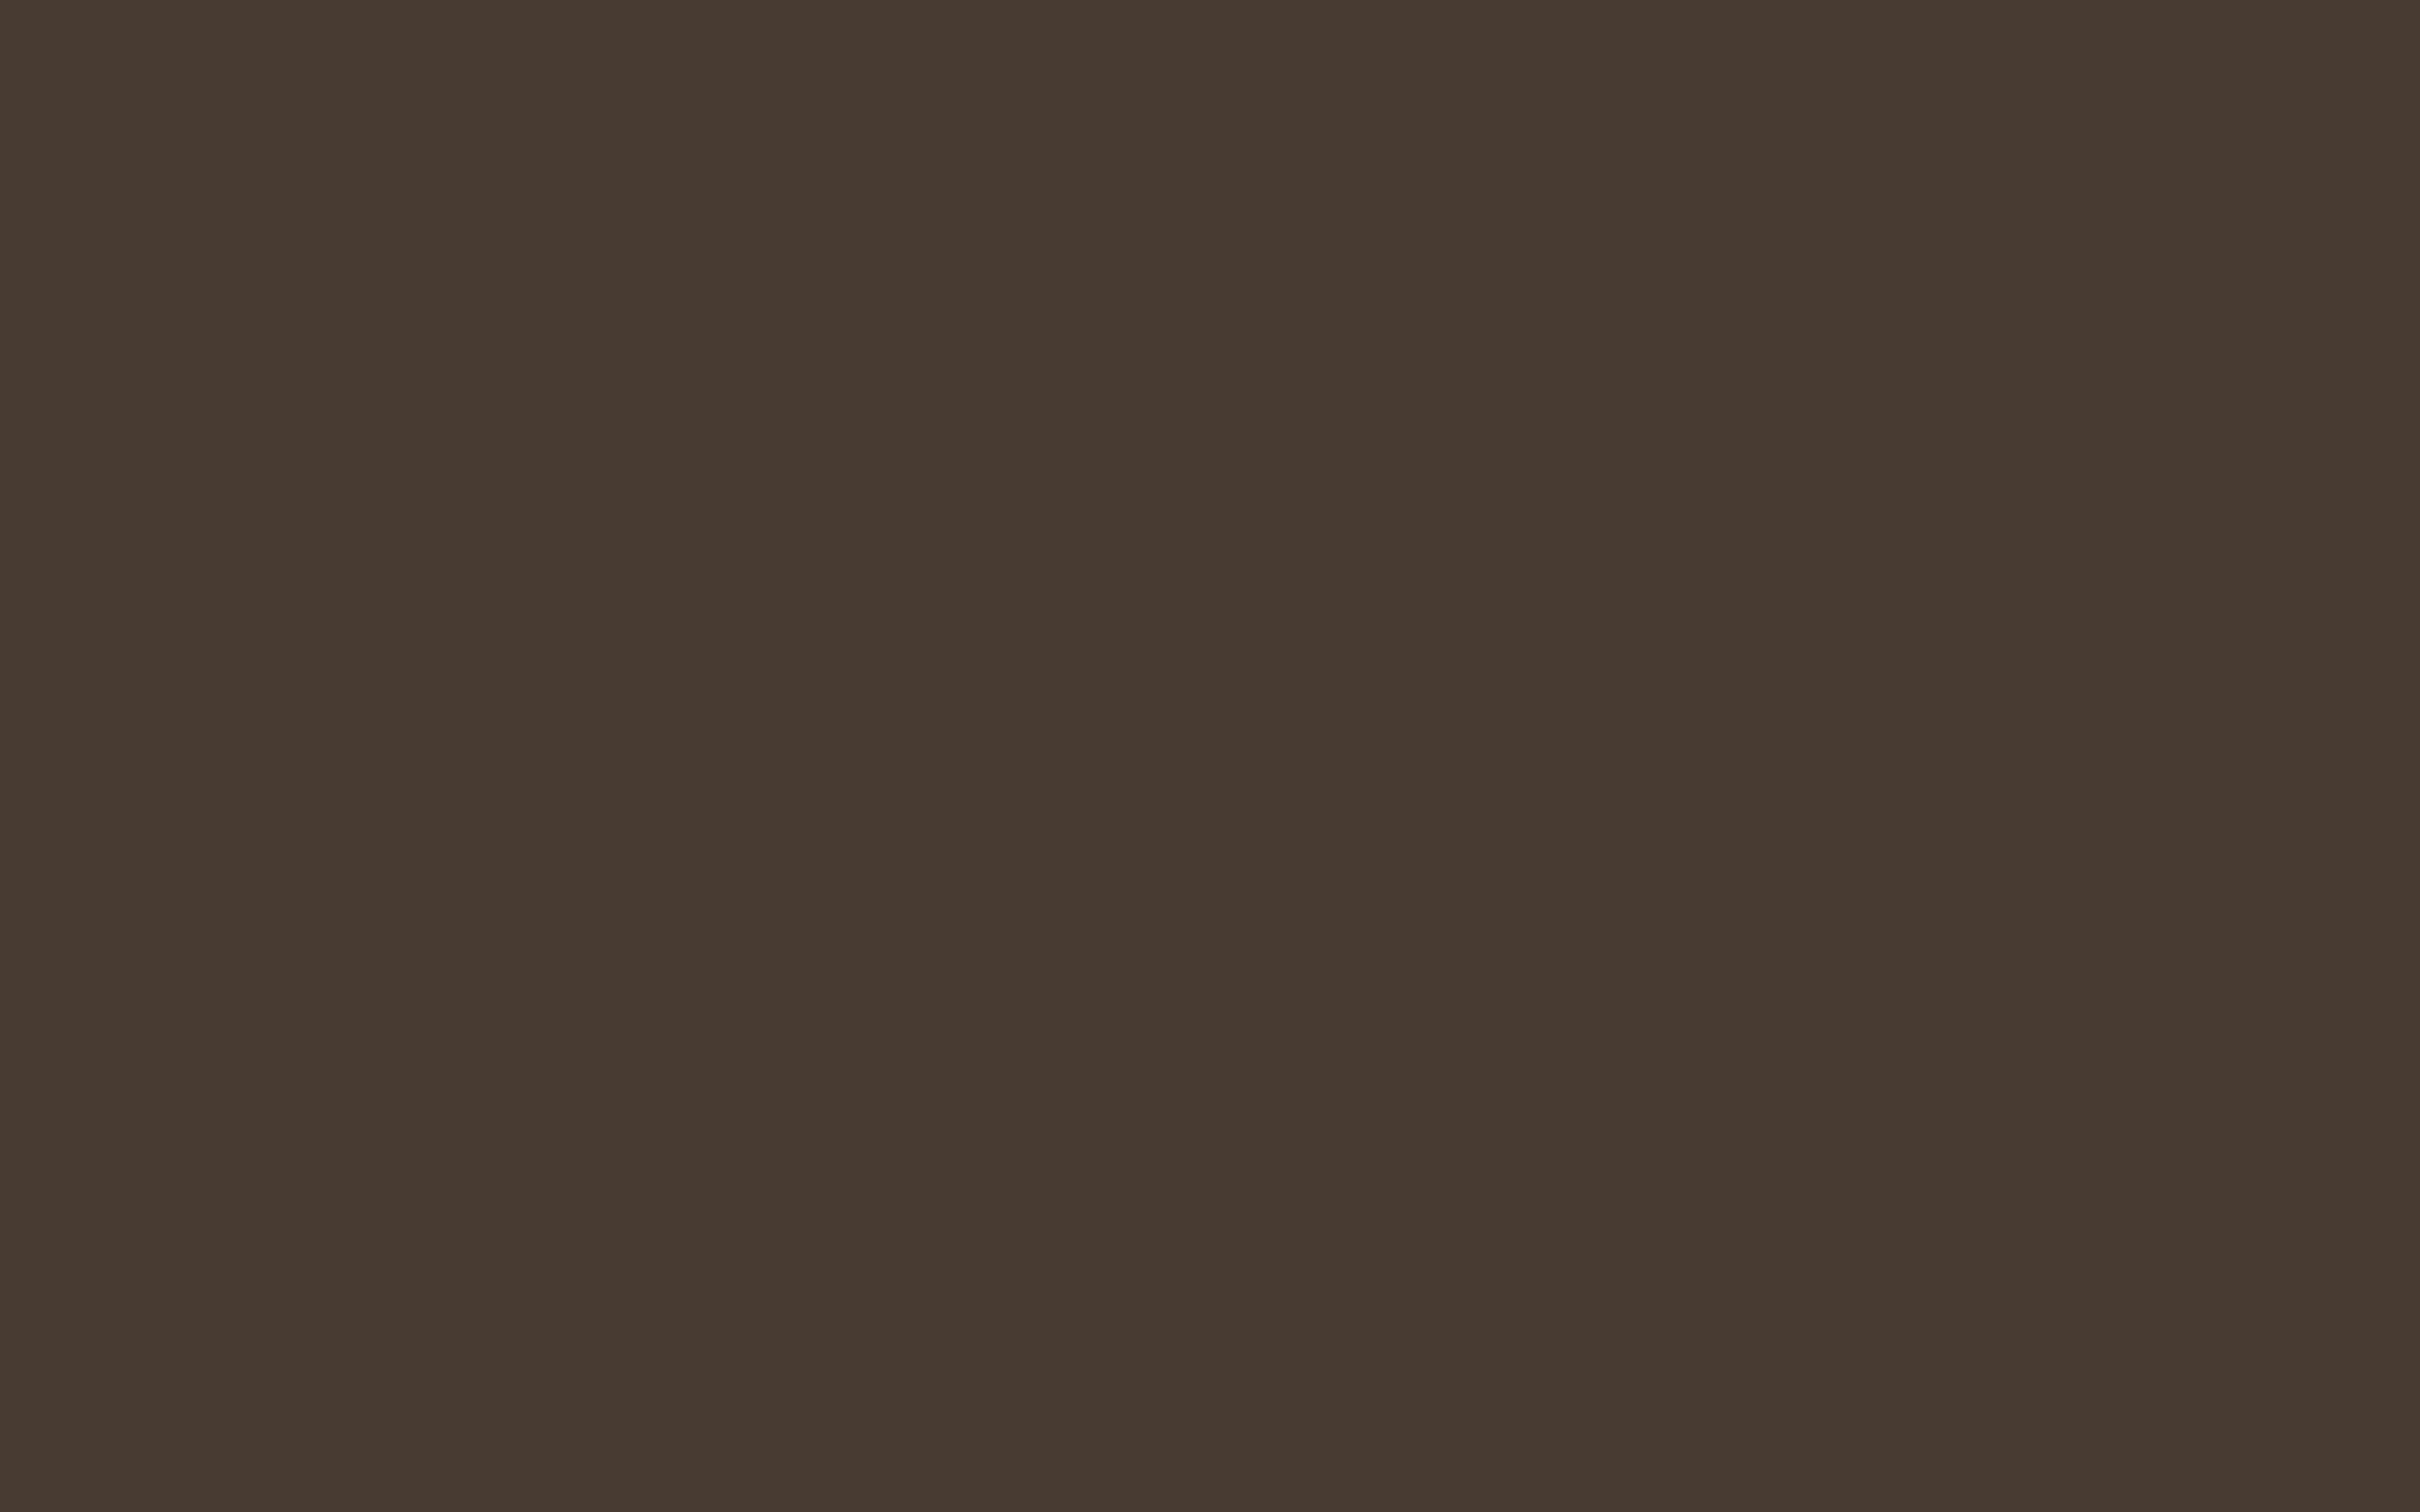 2560x1600 Dark Lava Solid Color Background